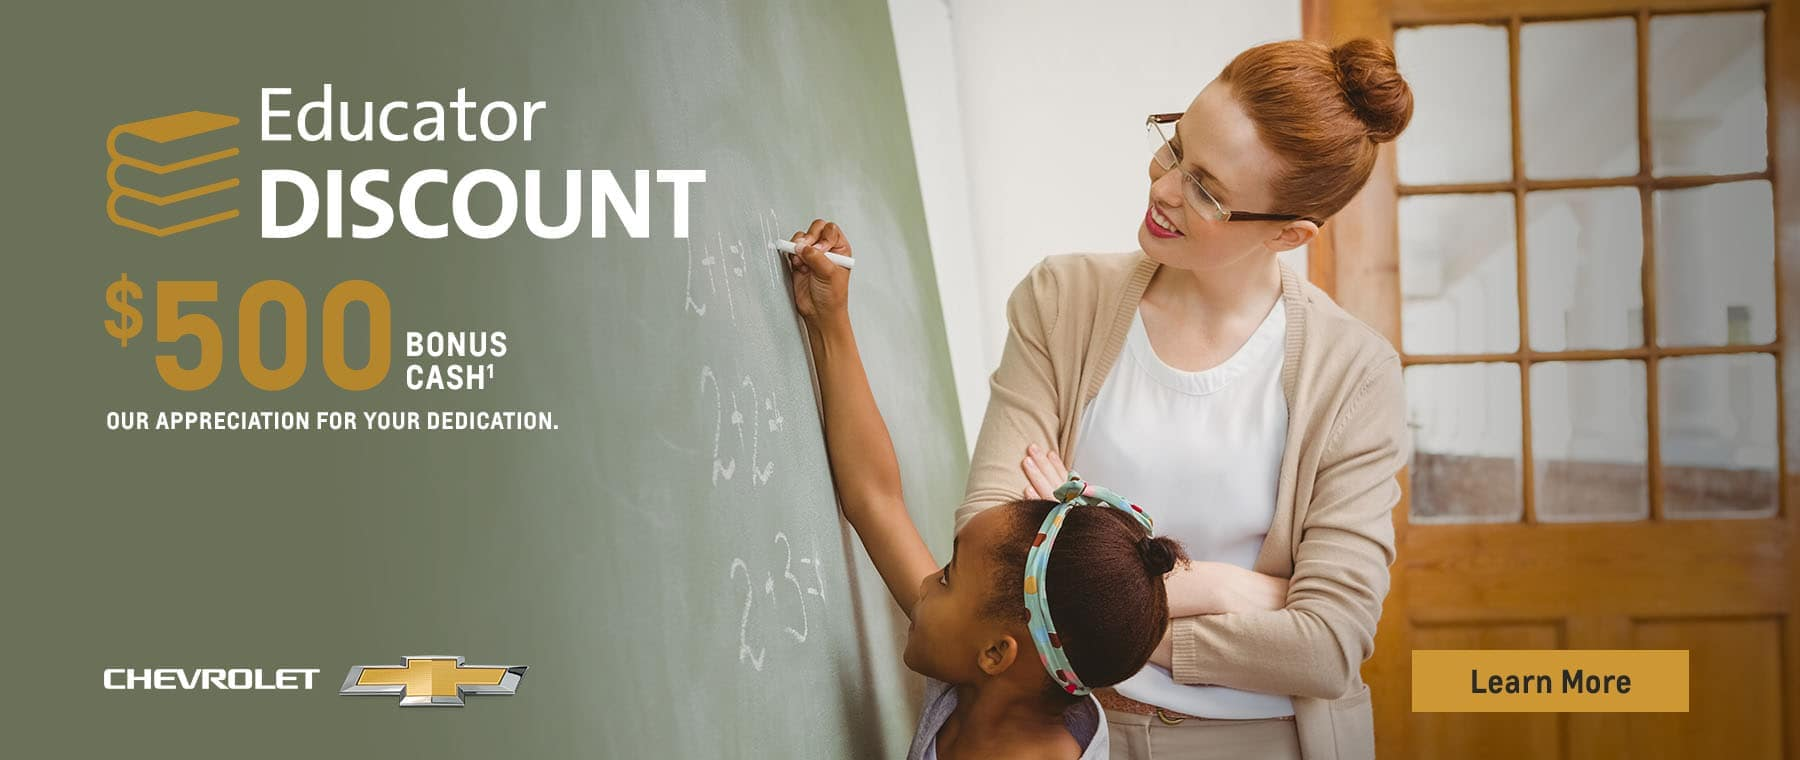 EDUCATOR-DISCOUNT_1800x760